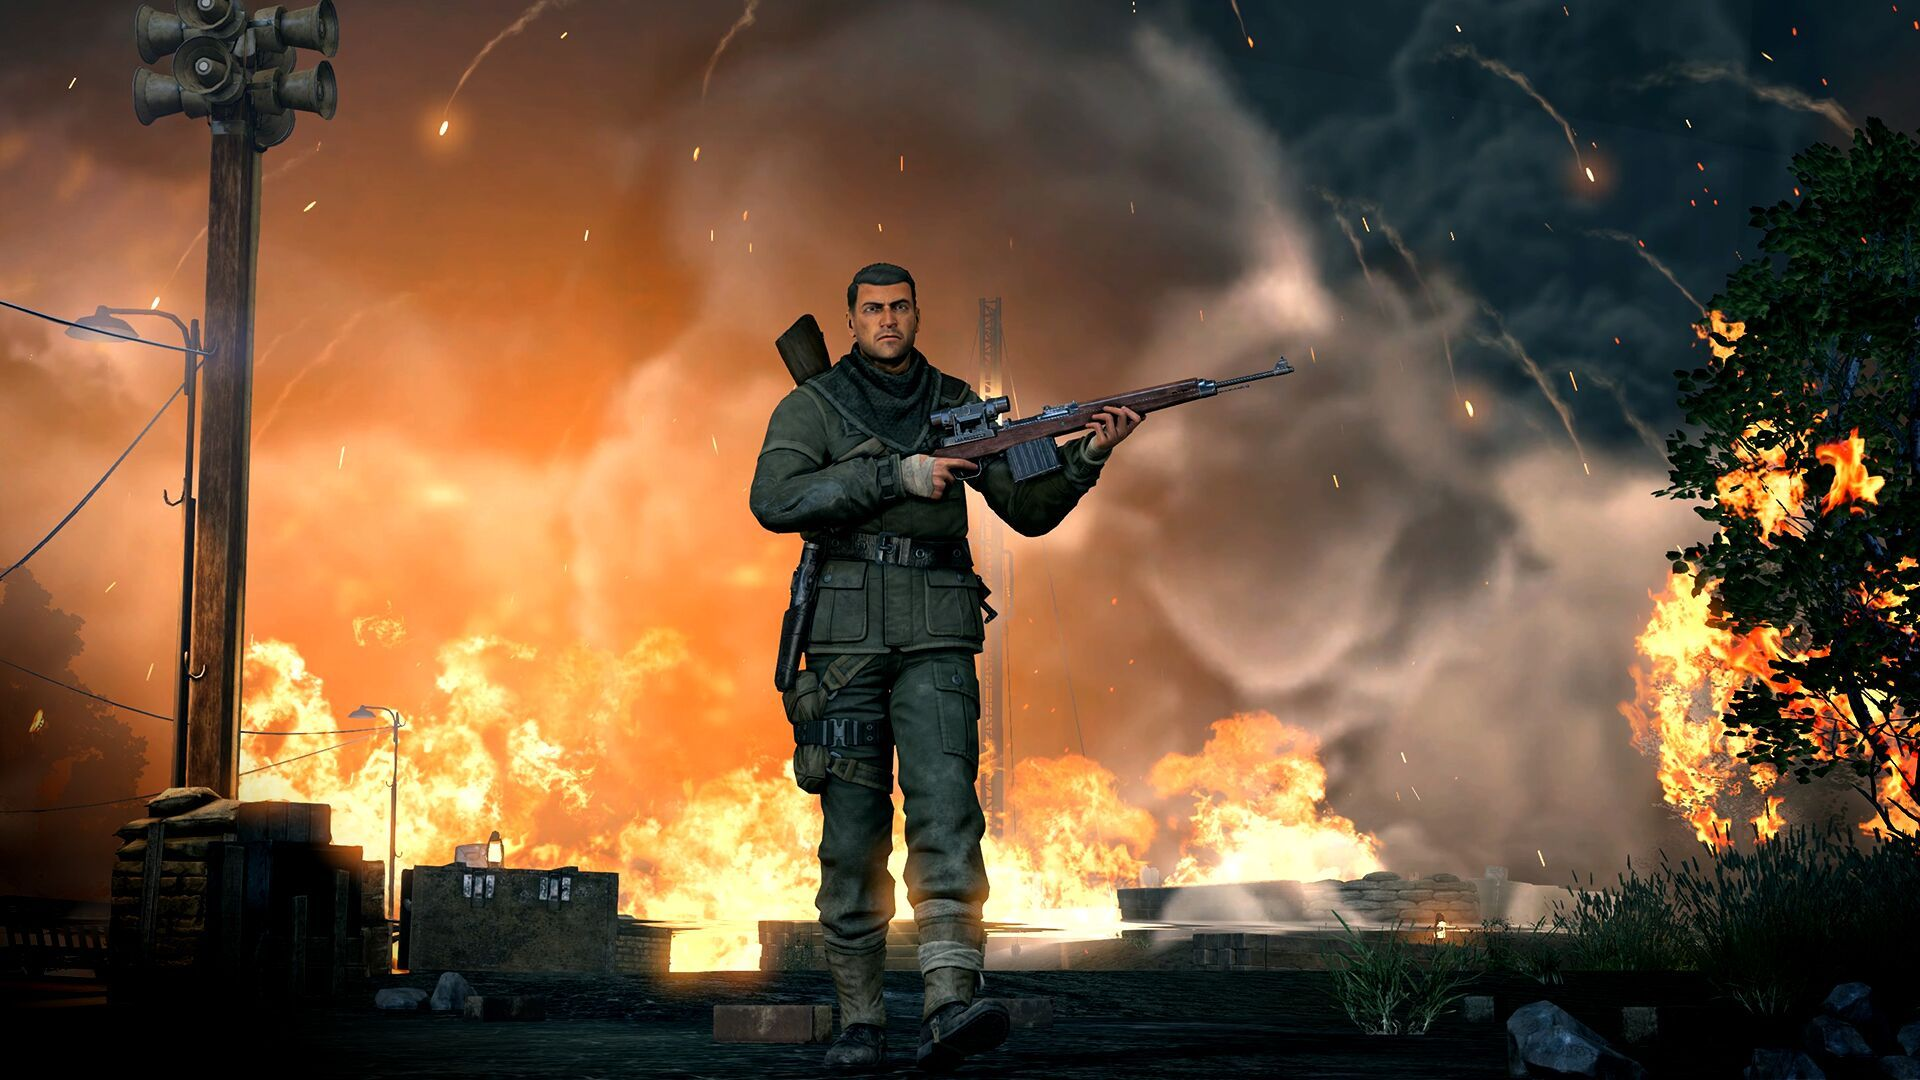 Sniper Elite 5 is coming, but not before Sniper Elite v2 Remastered